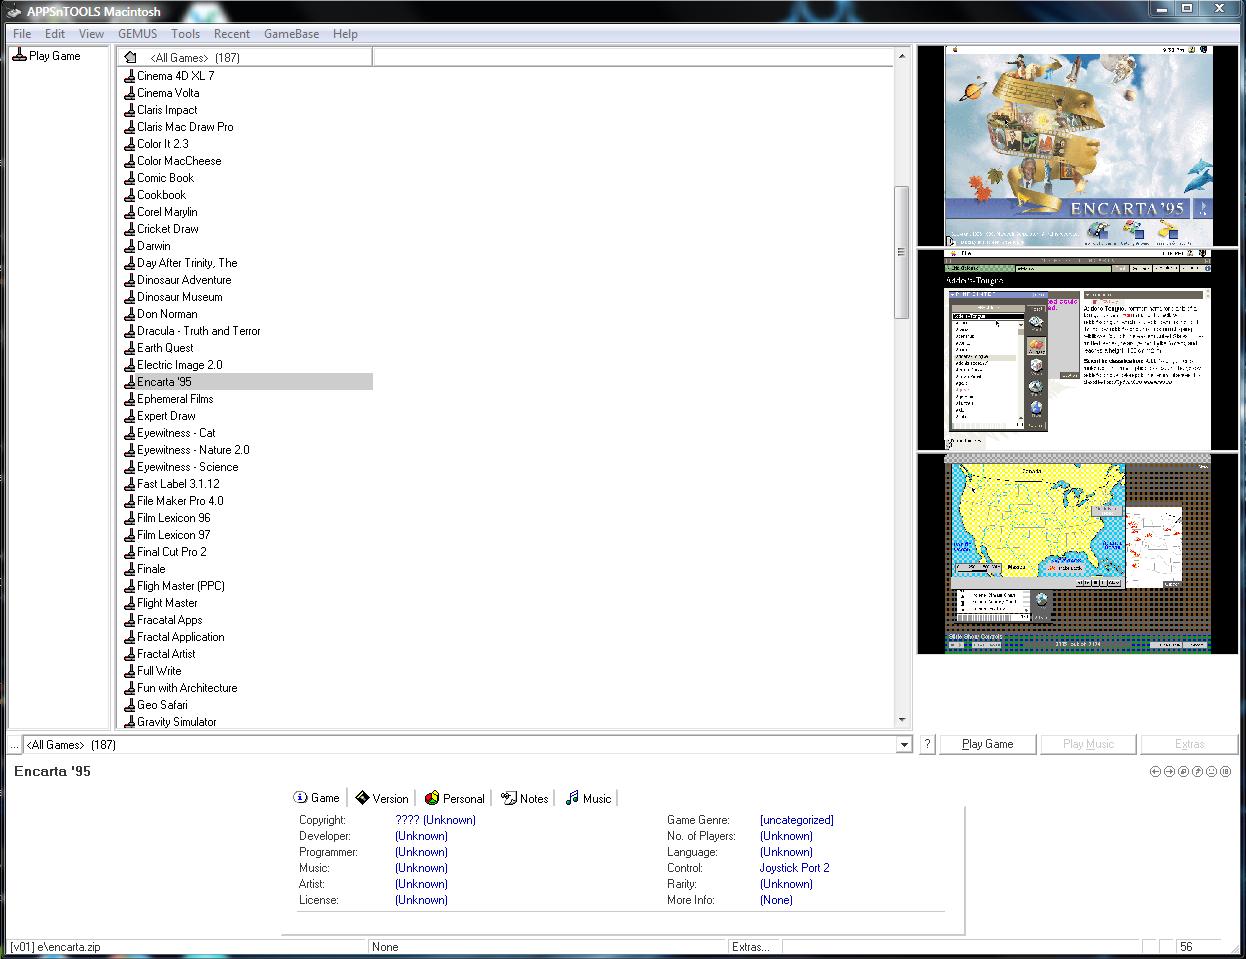 Seiya's GameBase Collections - English Amiga Board